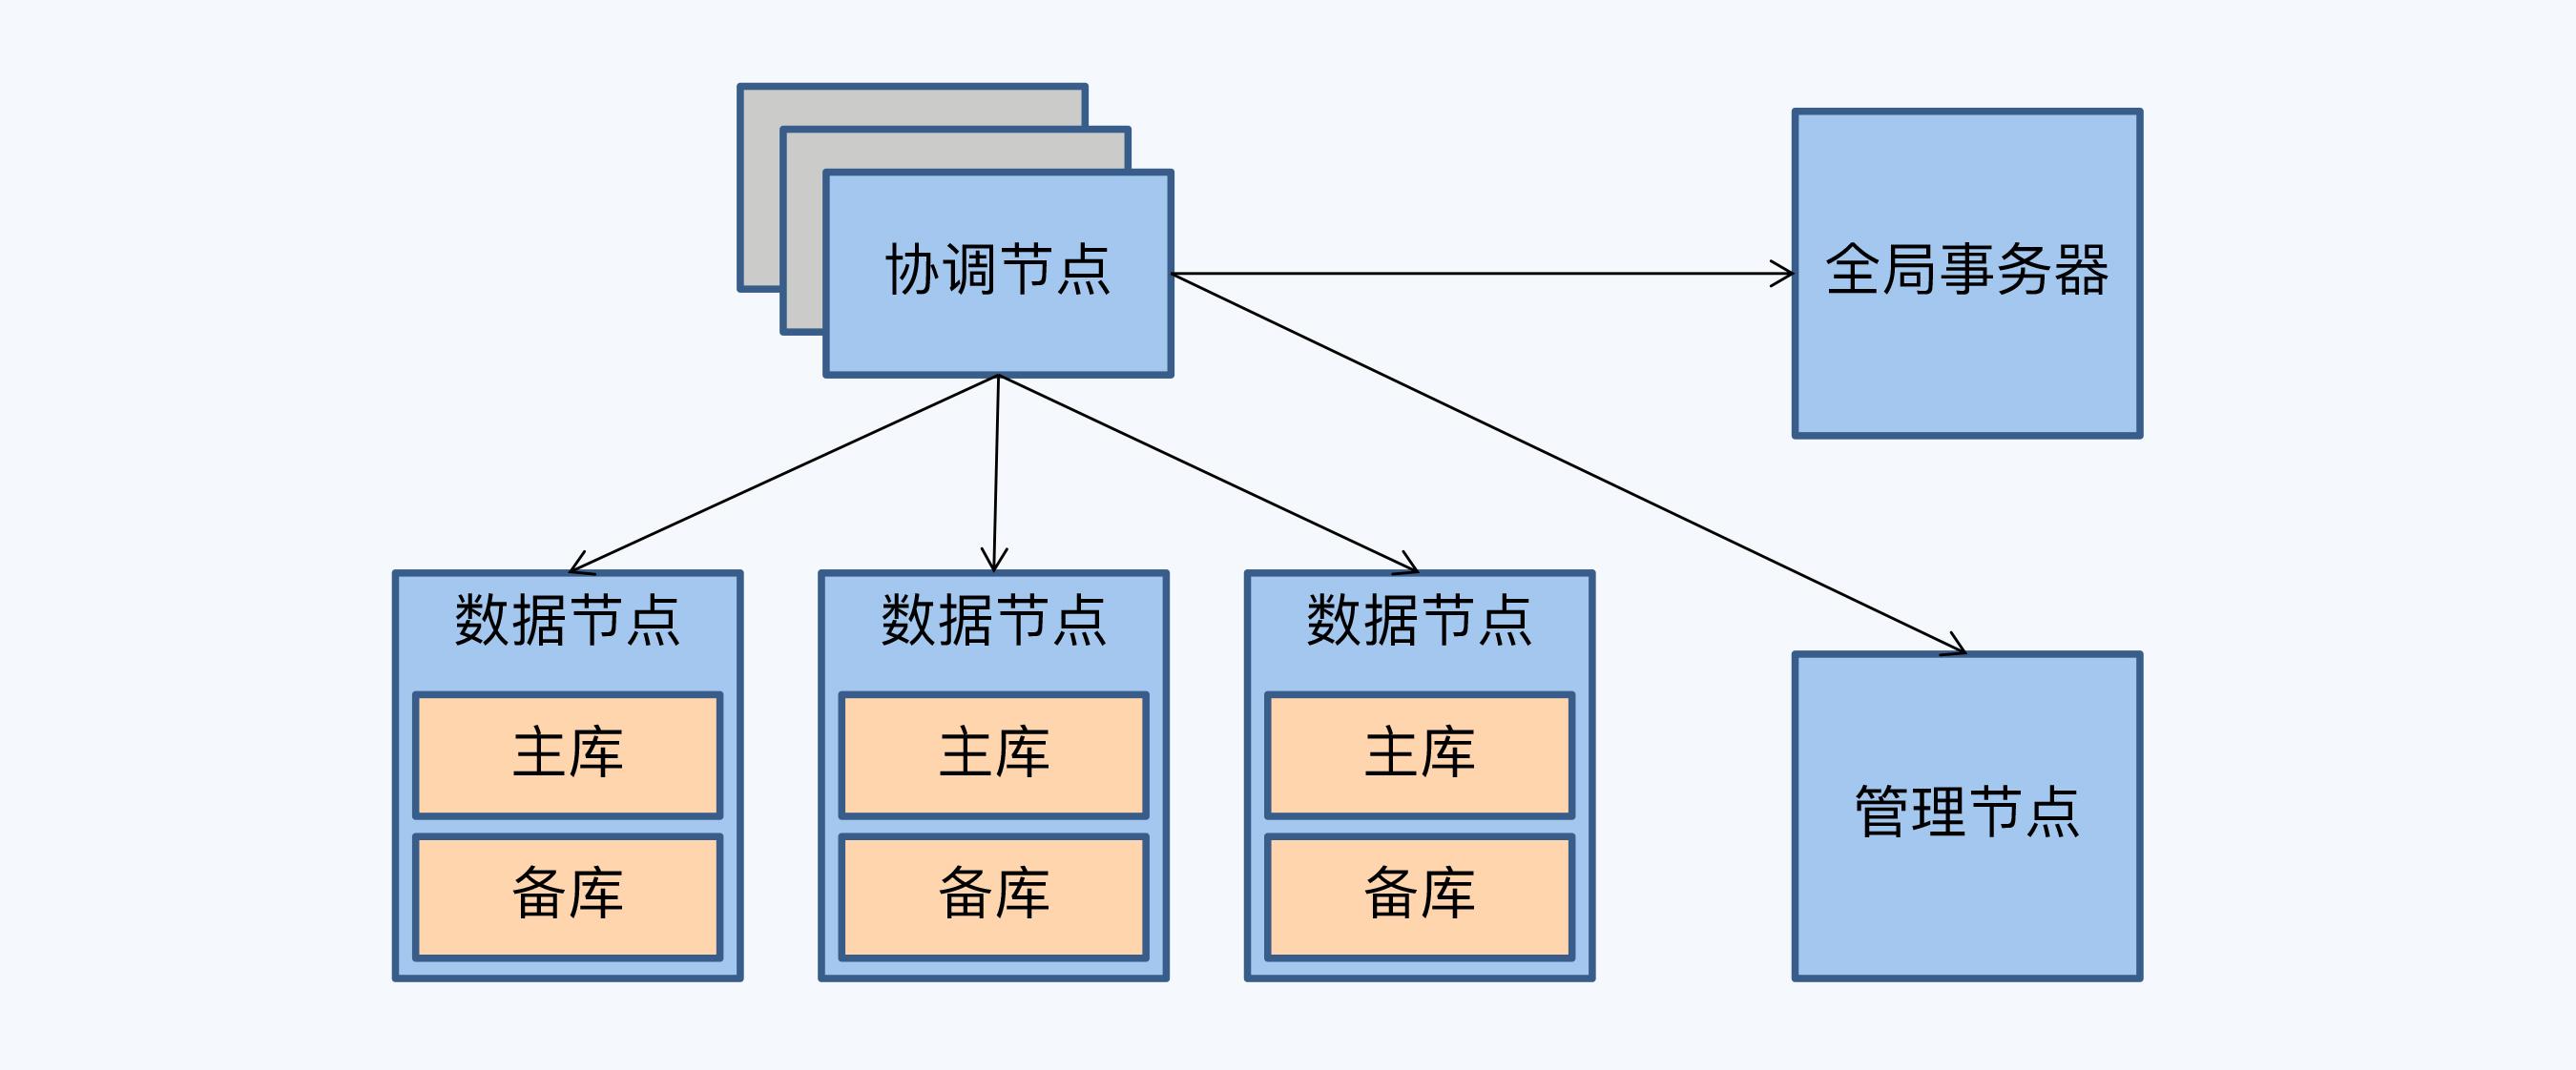 GoldenDB 架构图